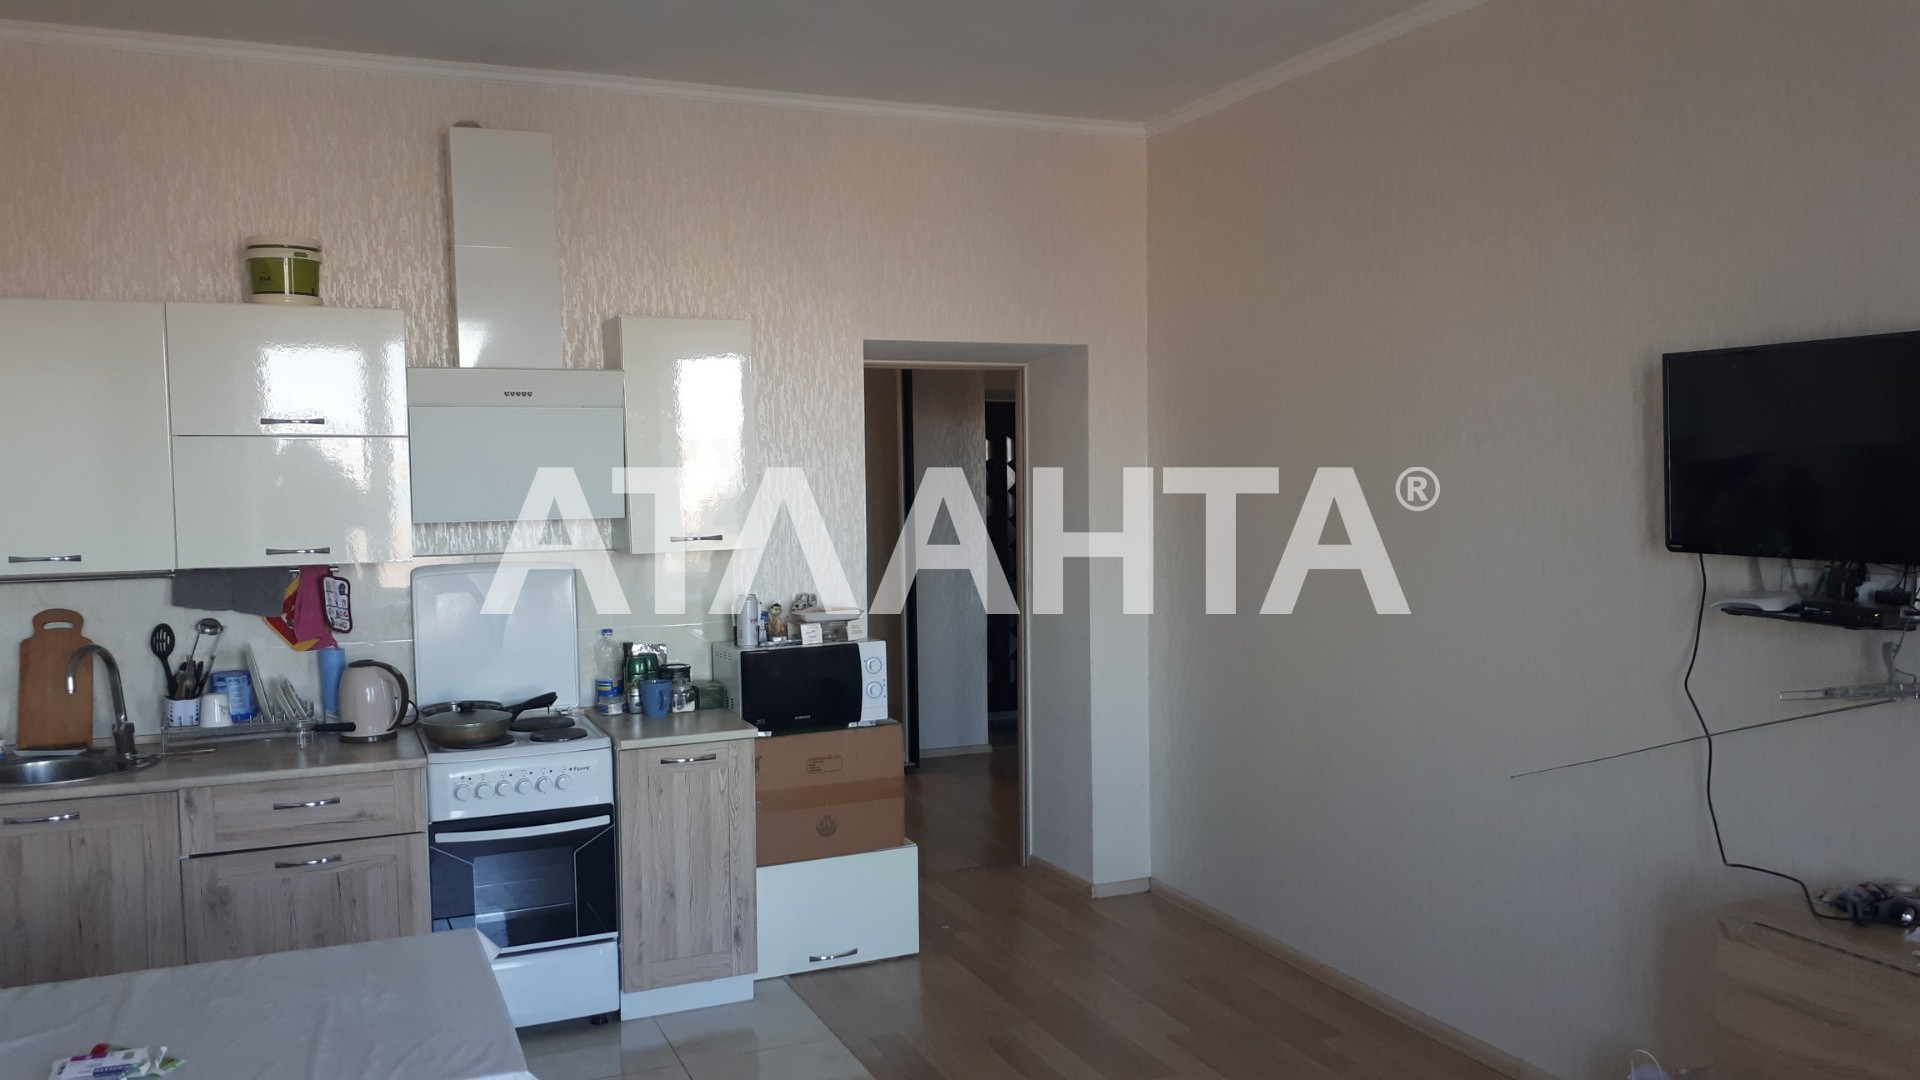 Продается 2-комнатная Квартира на ул. Хантадзе Пер. — 63 000 у.е. (фото №5)